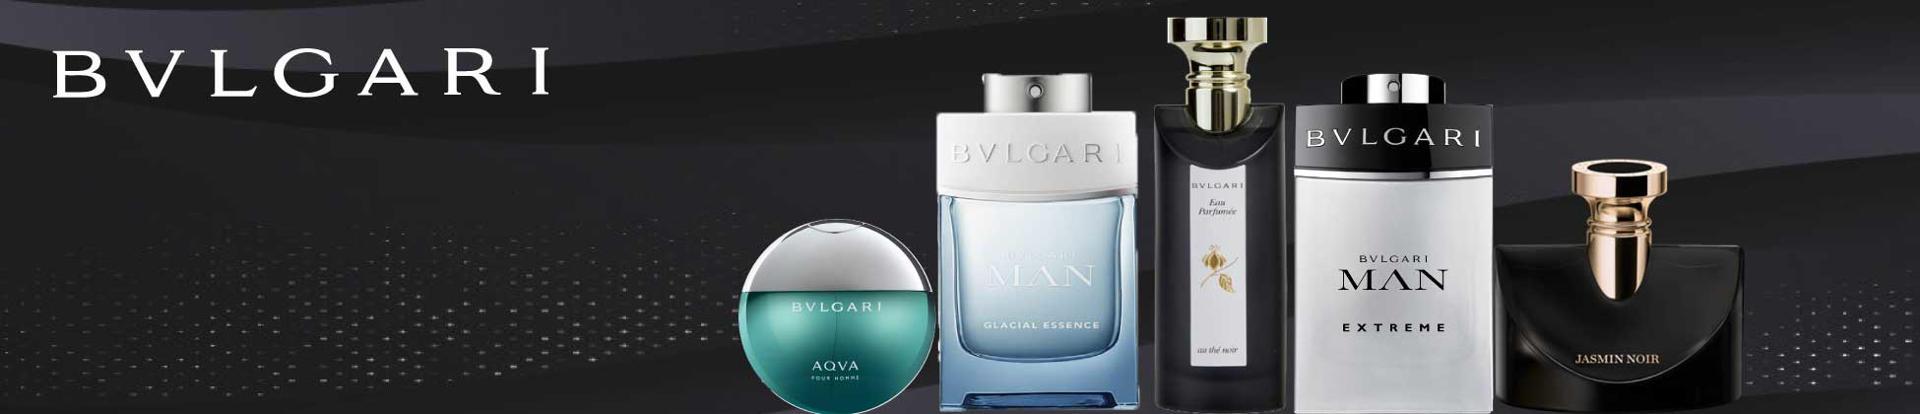 Picture for brand BVLGARI